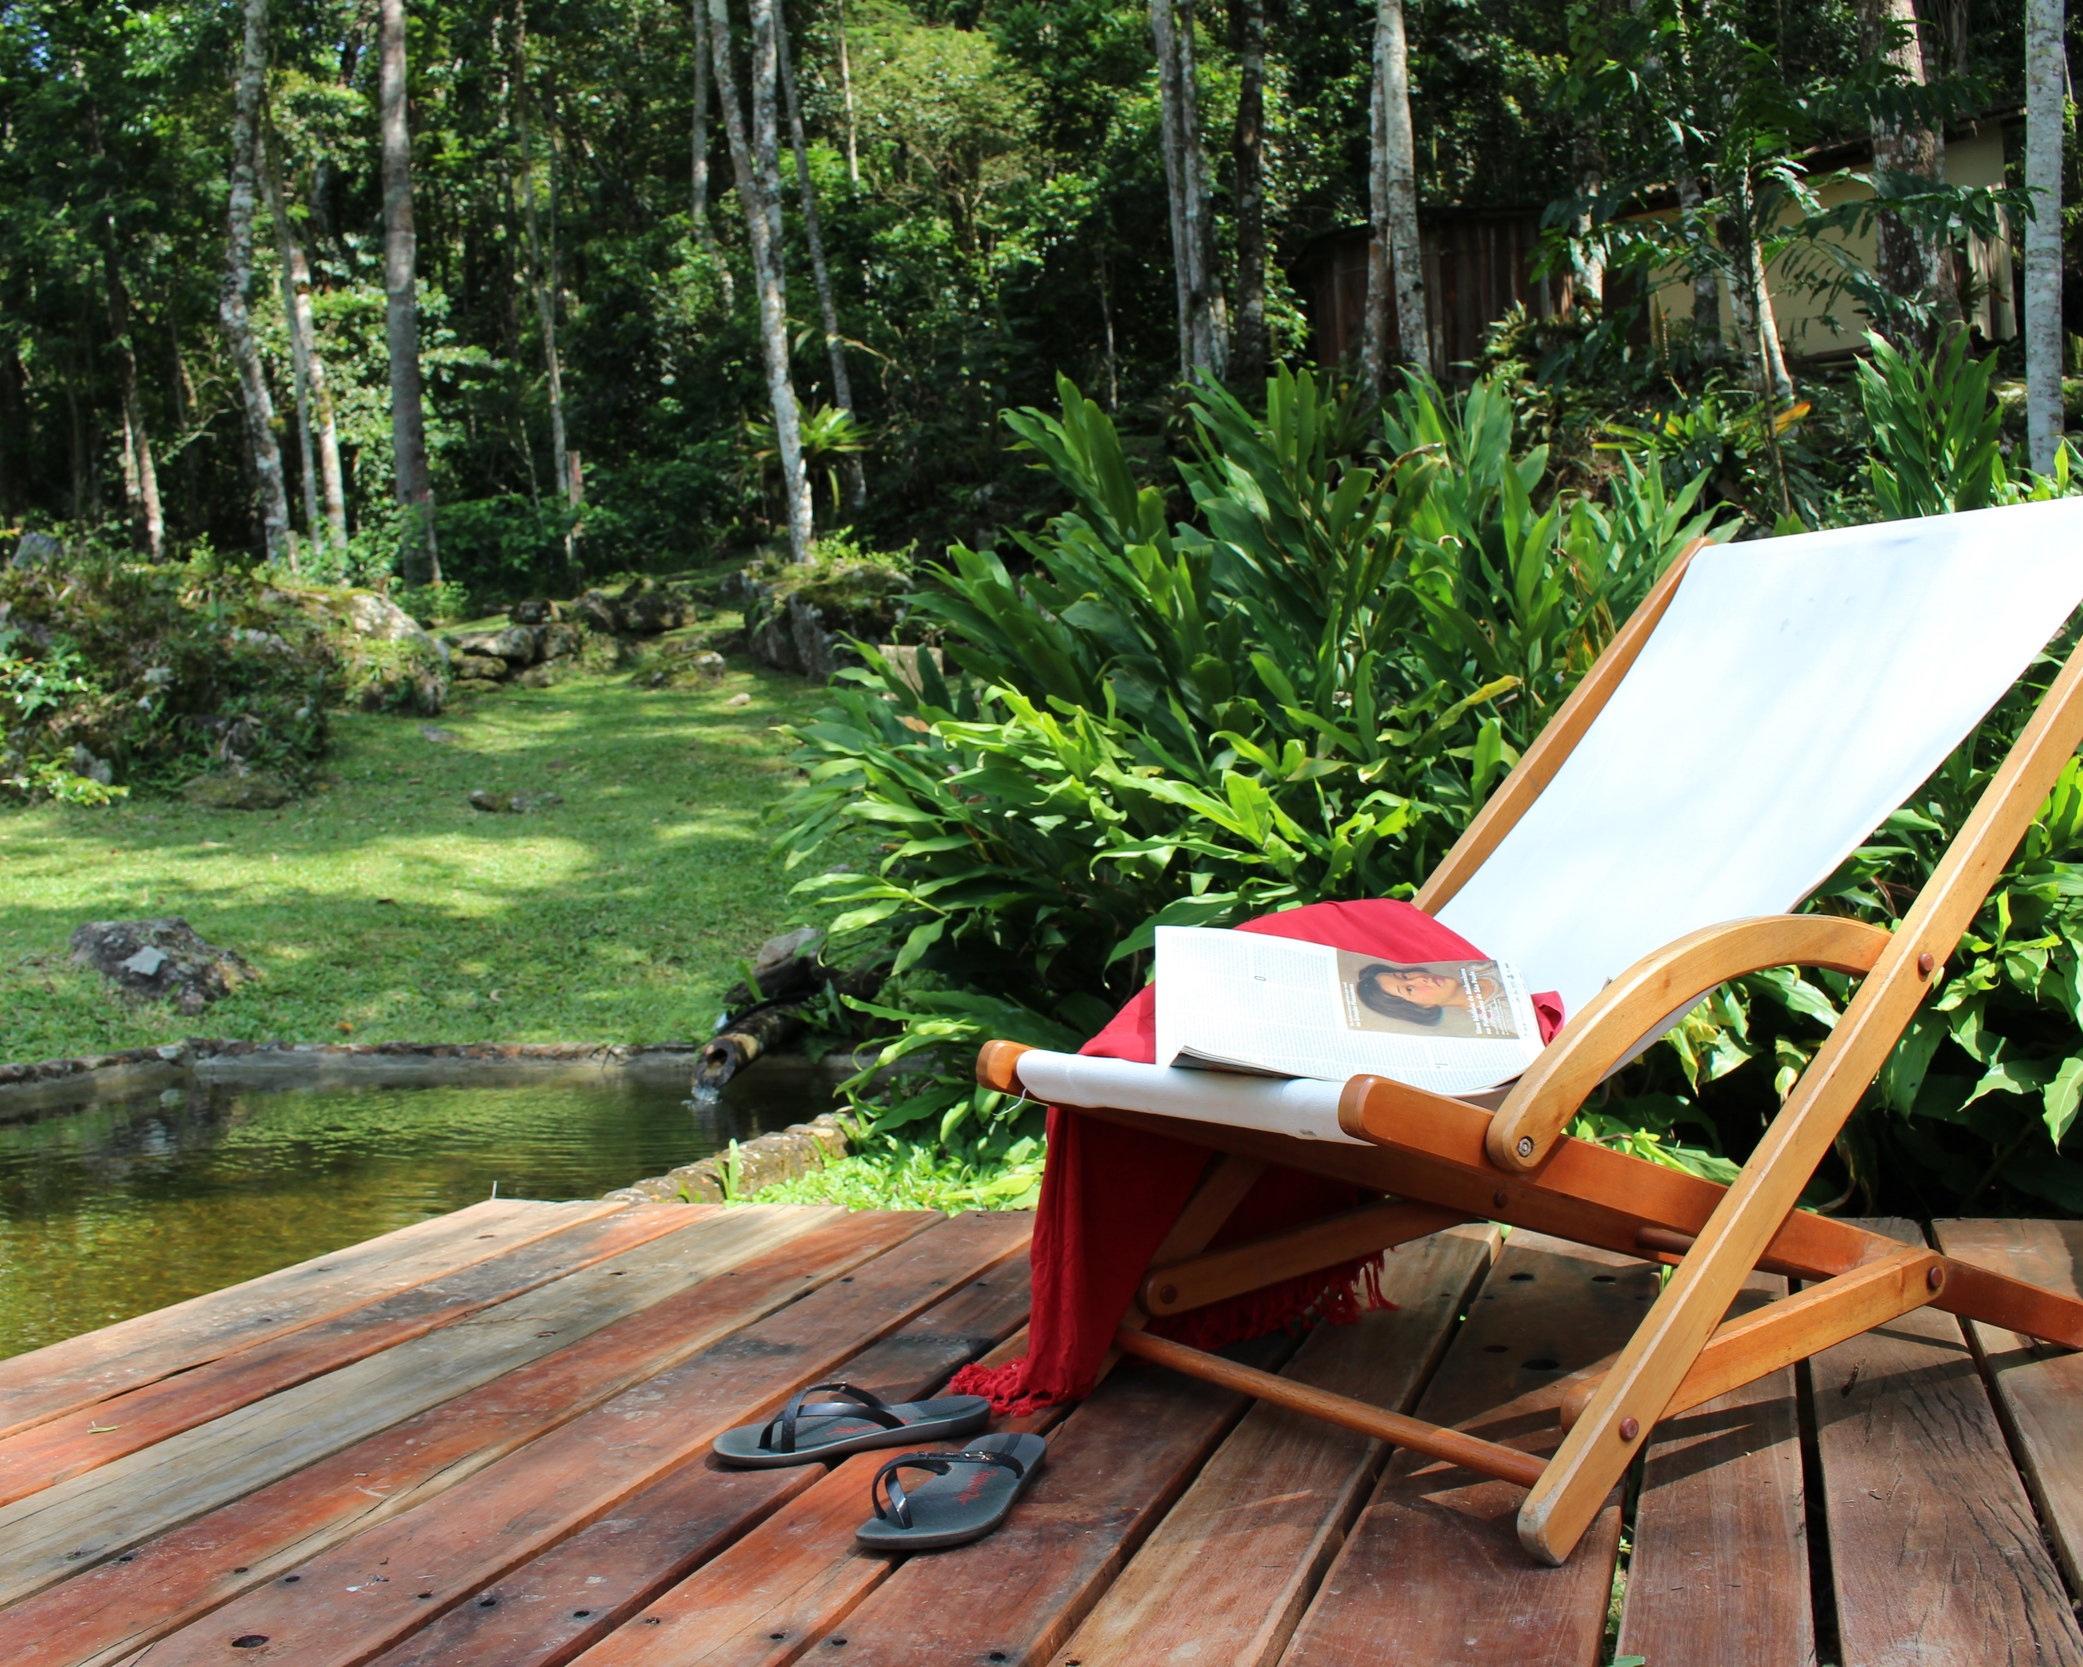 Rainforest - Beautiful Nature Lodge in the Atlantic Rainforest.